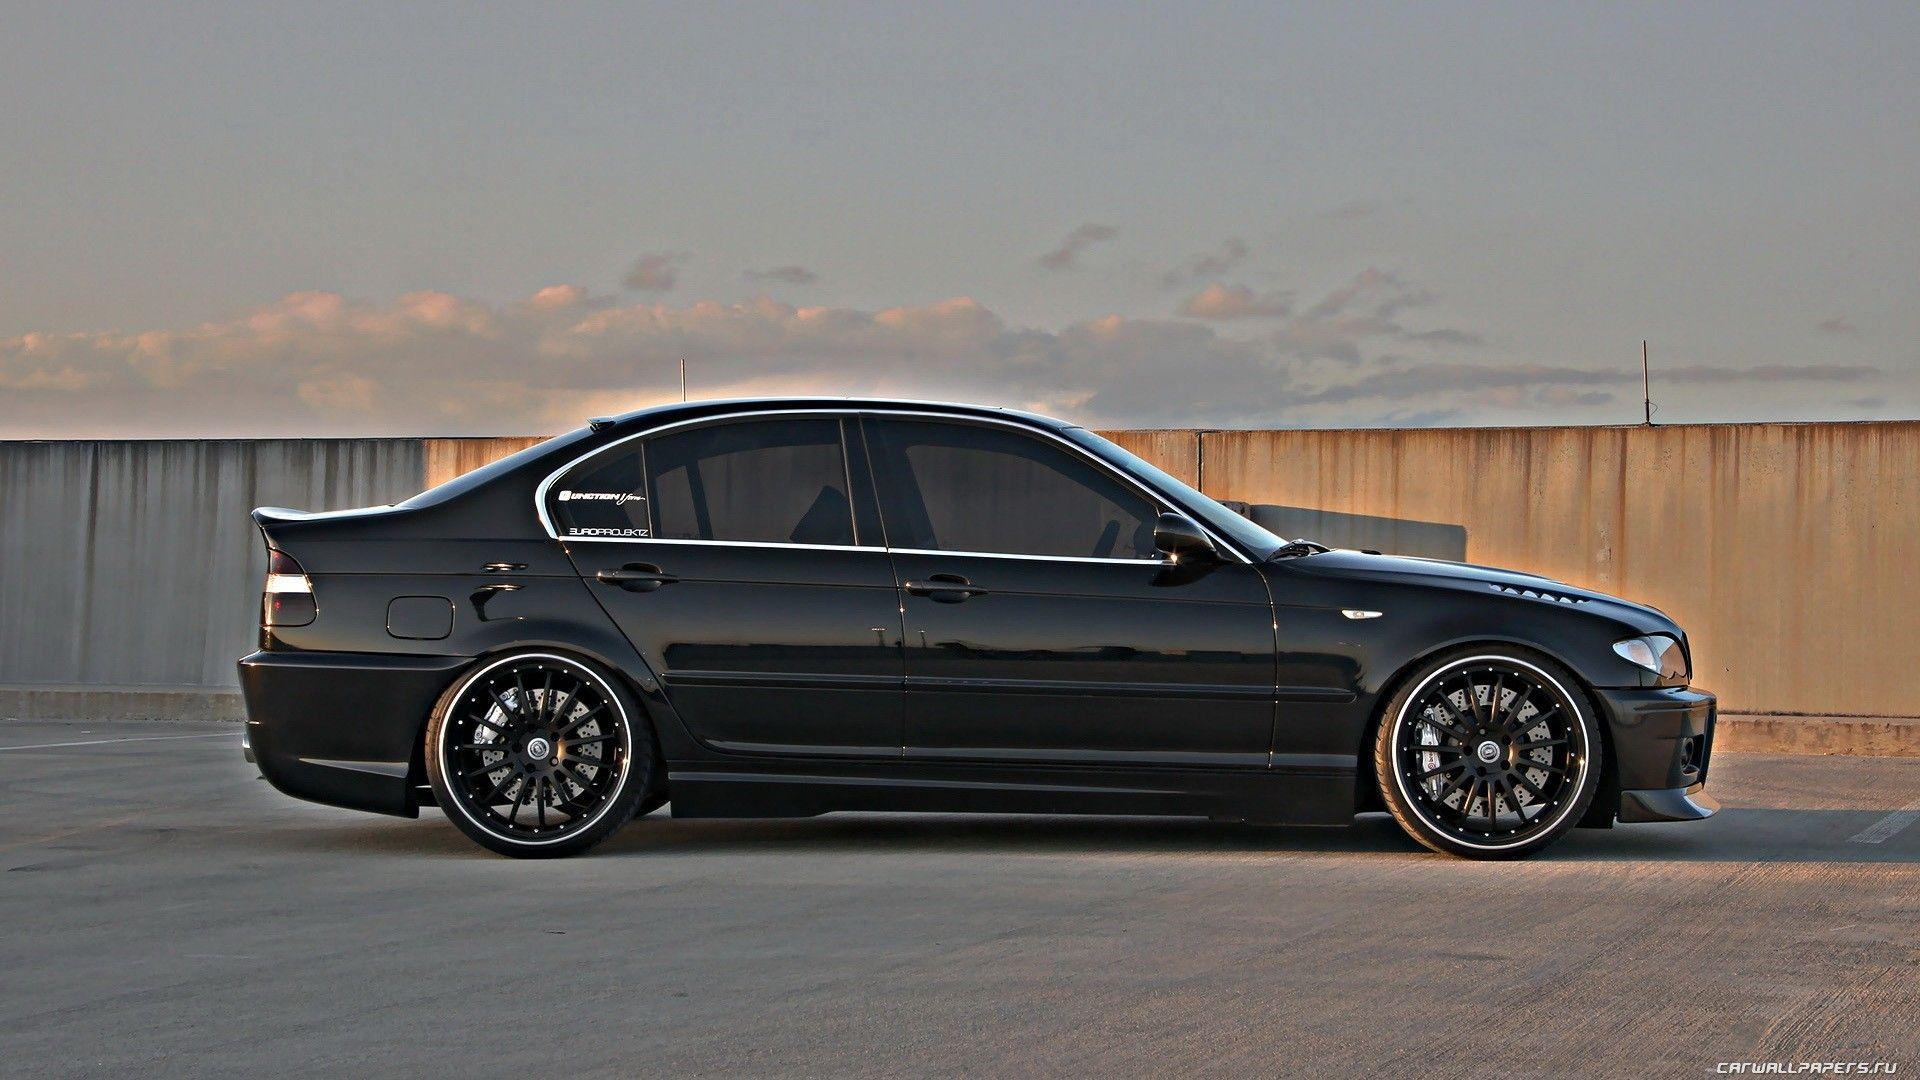 Res 1920x1080 Bmw Black Cars Bmw E46 Black Cars Free Wallpaper Wallpaperjam Com Bmw E46 Bmw Black Car